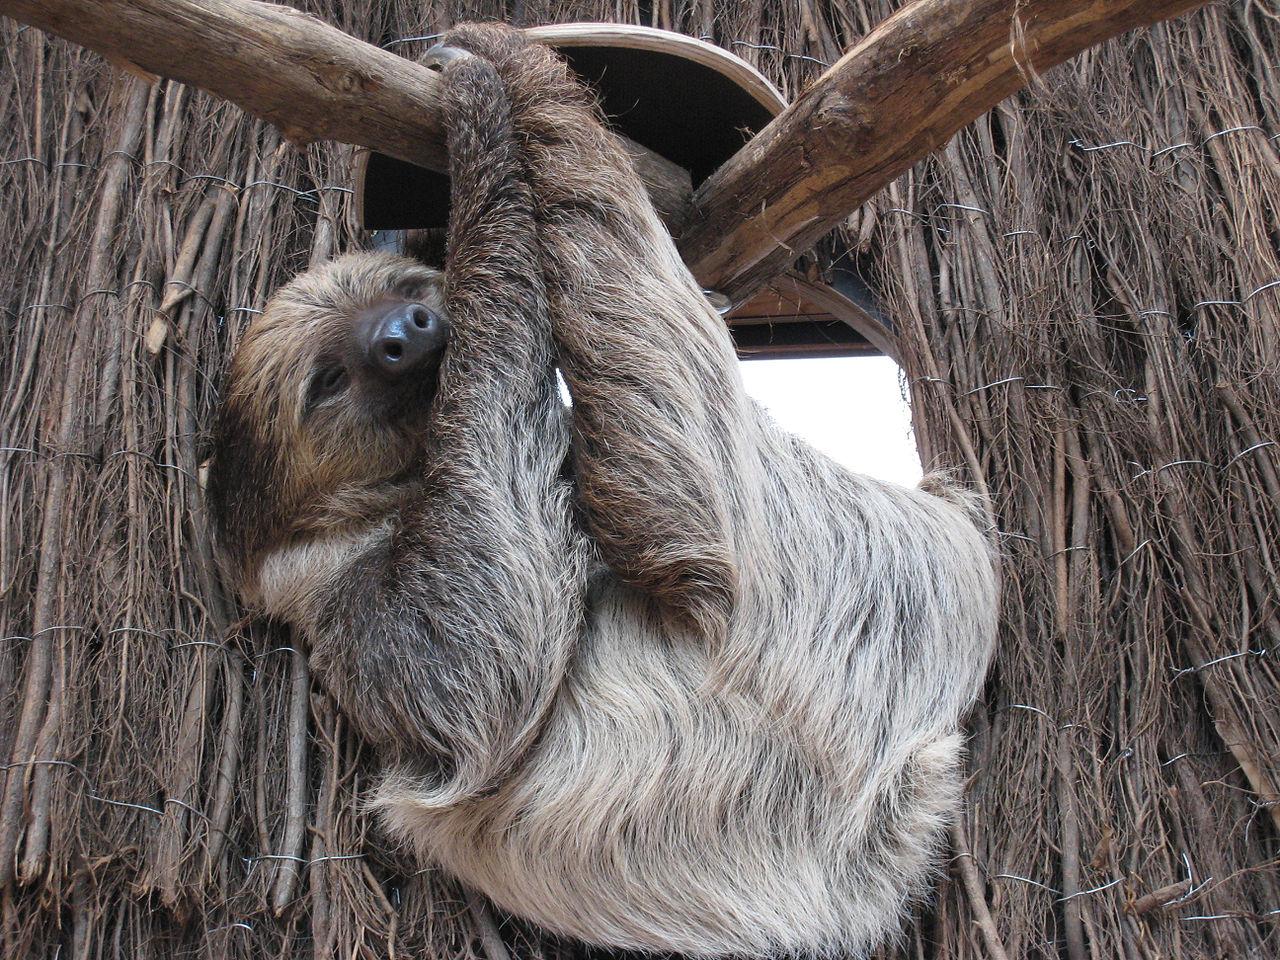 File:Zoo Dortmund Faultier.jpg - Wikipedia